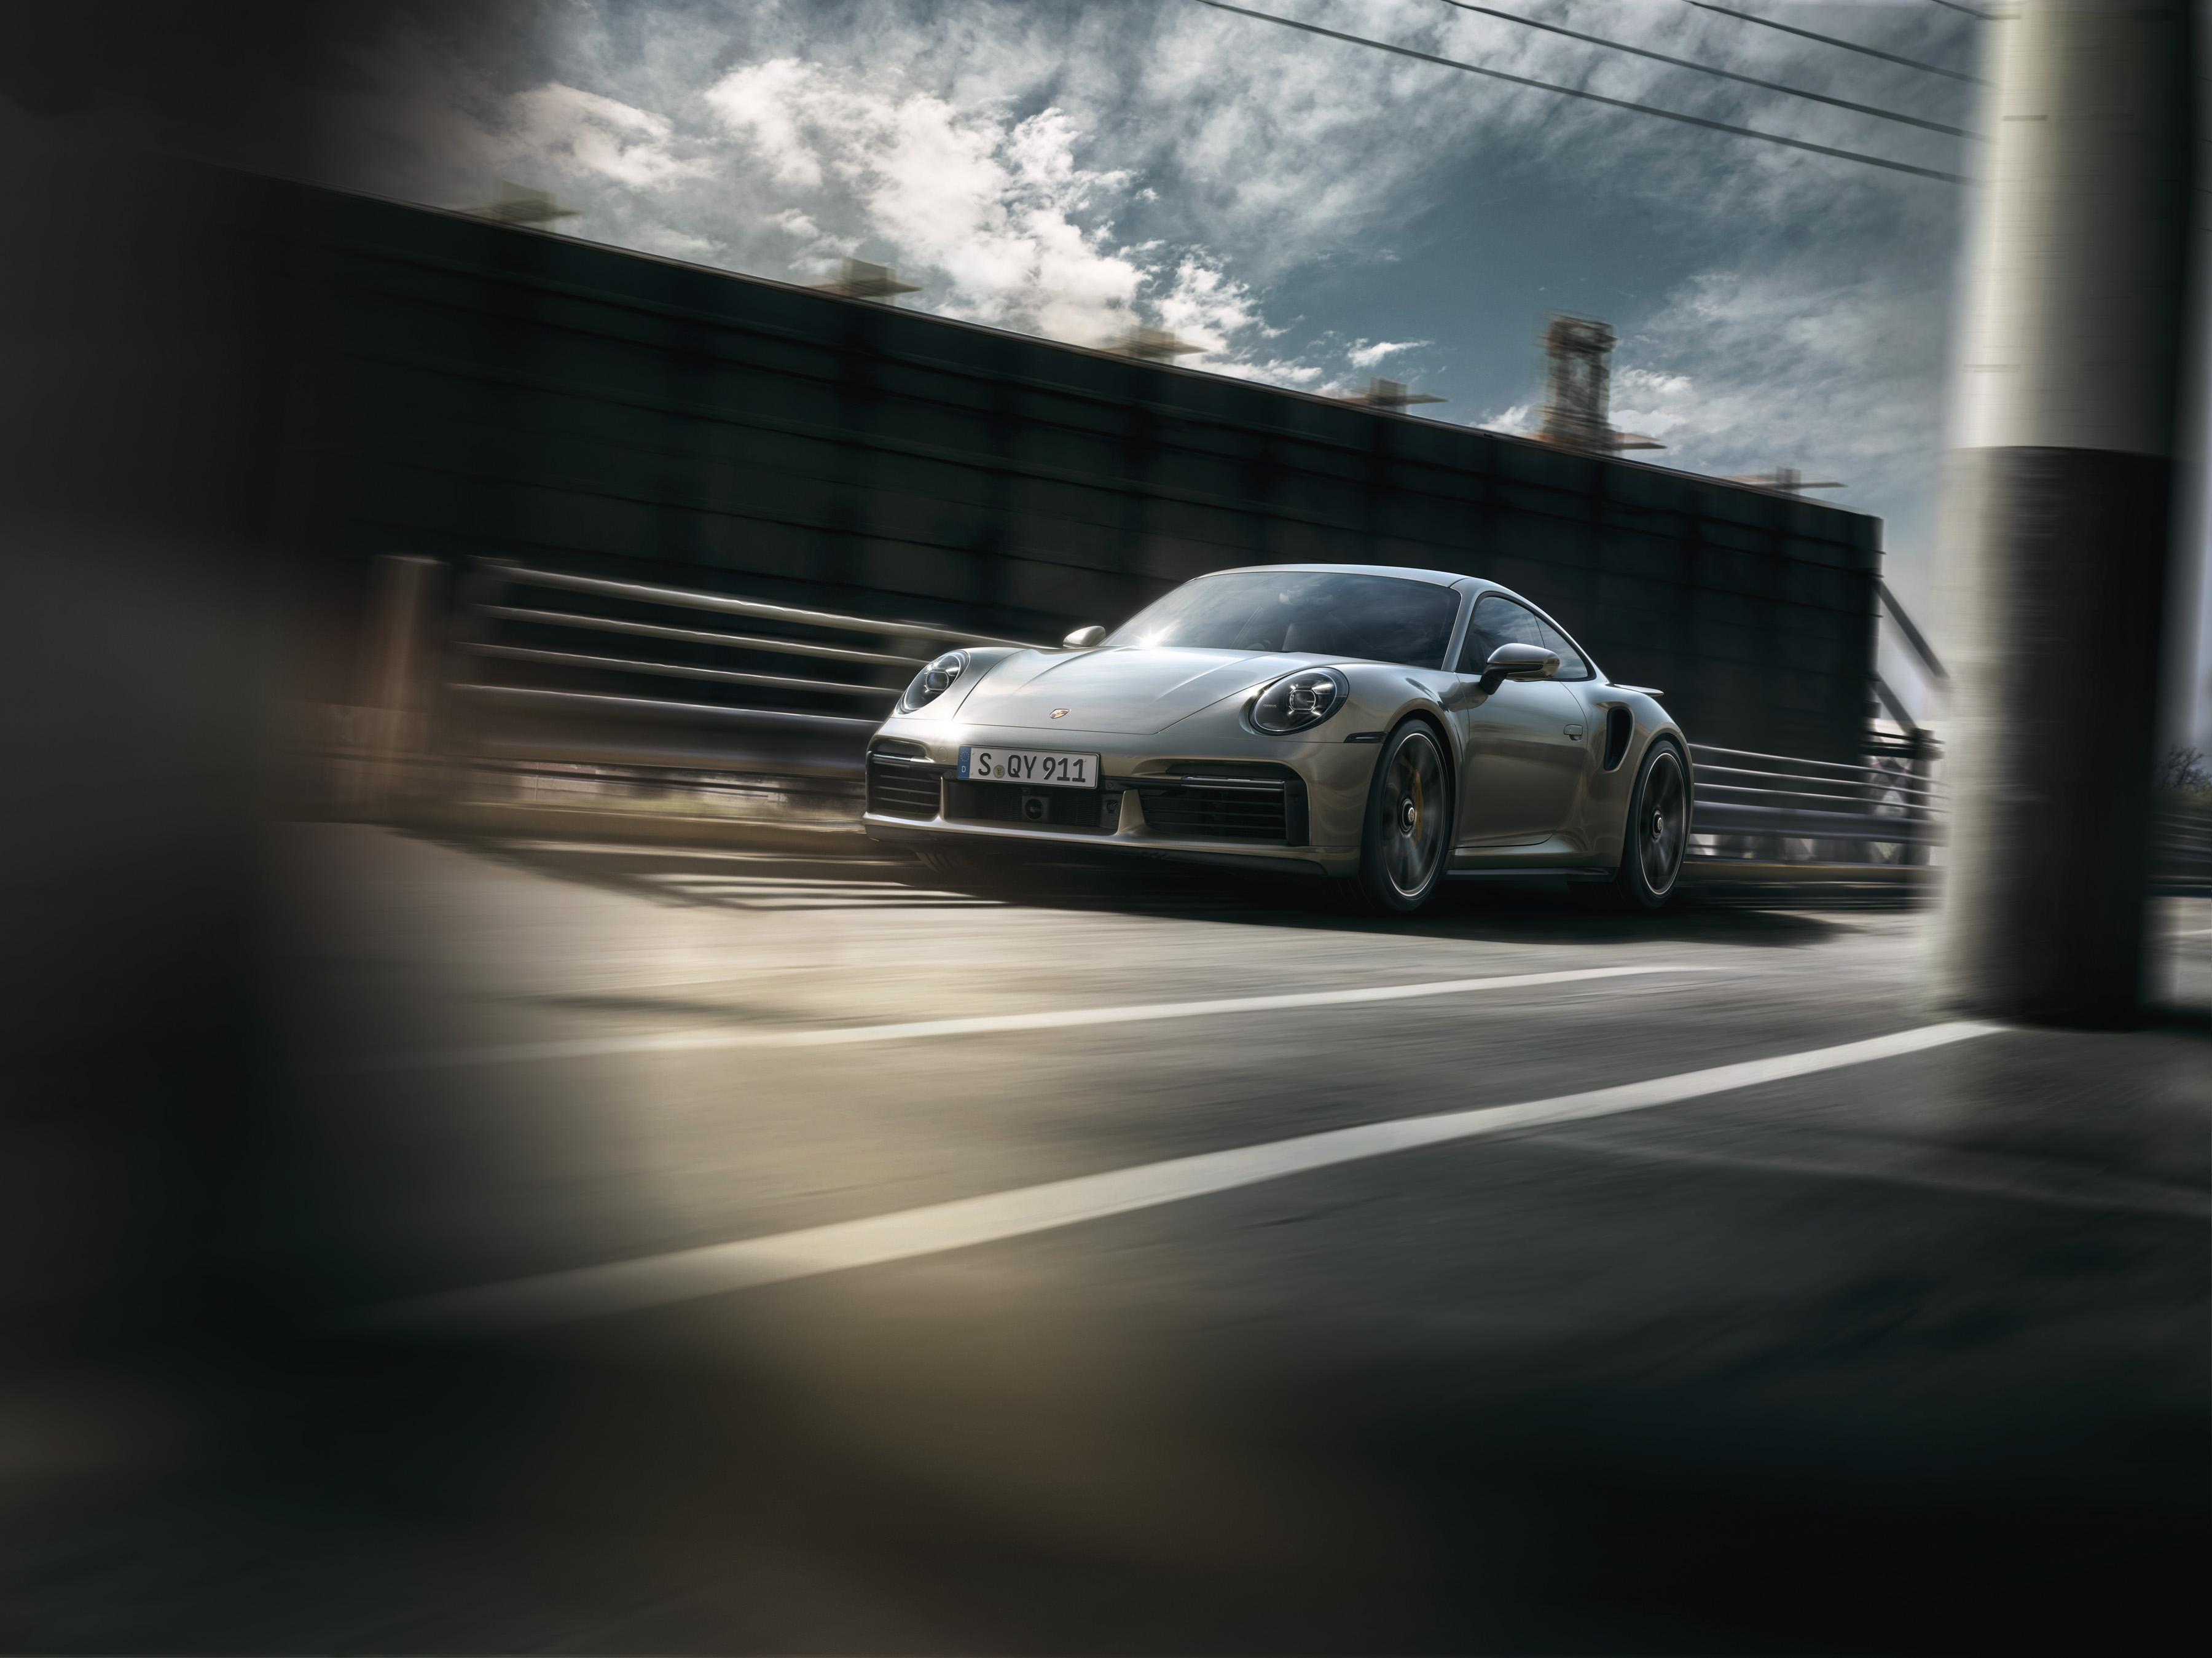 uj 911 turbo s